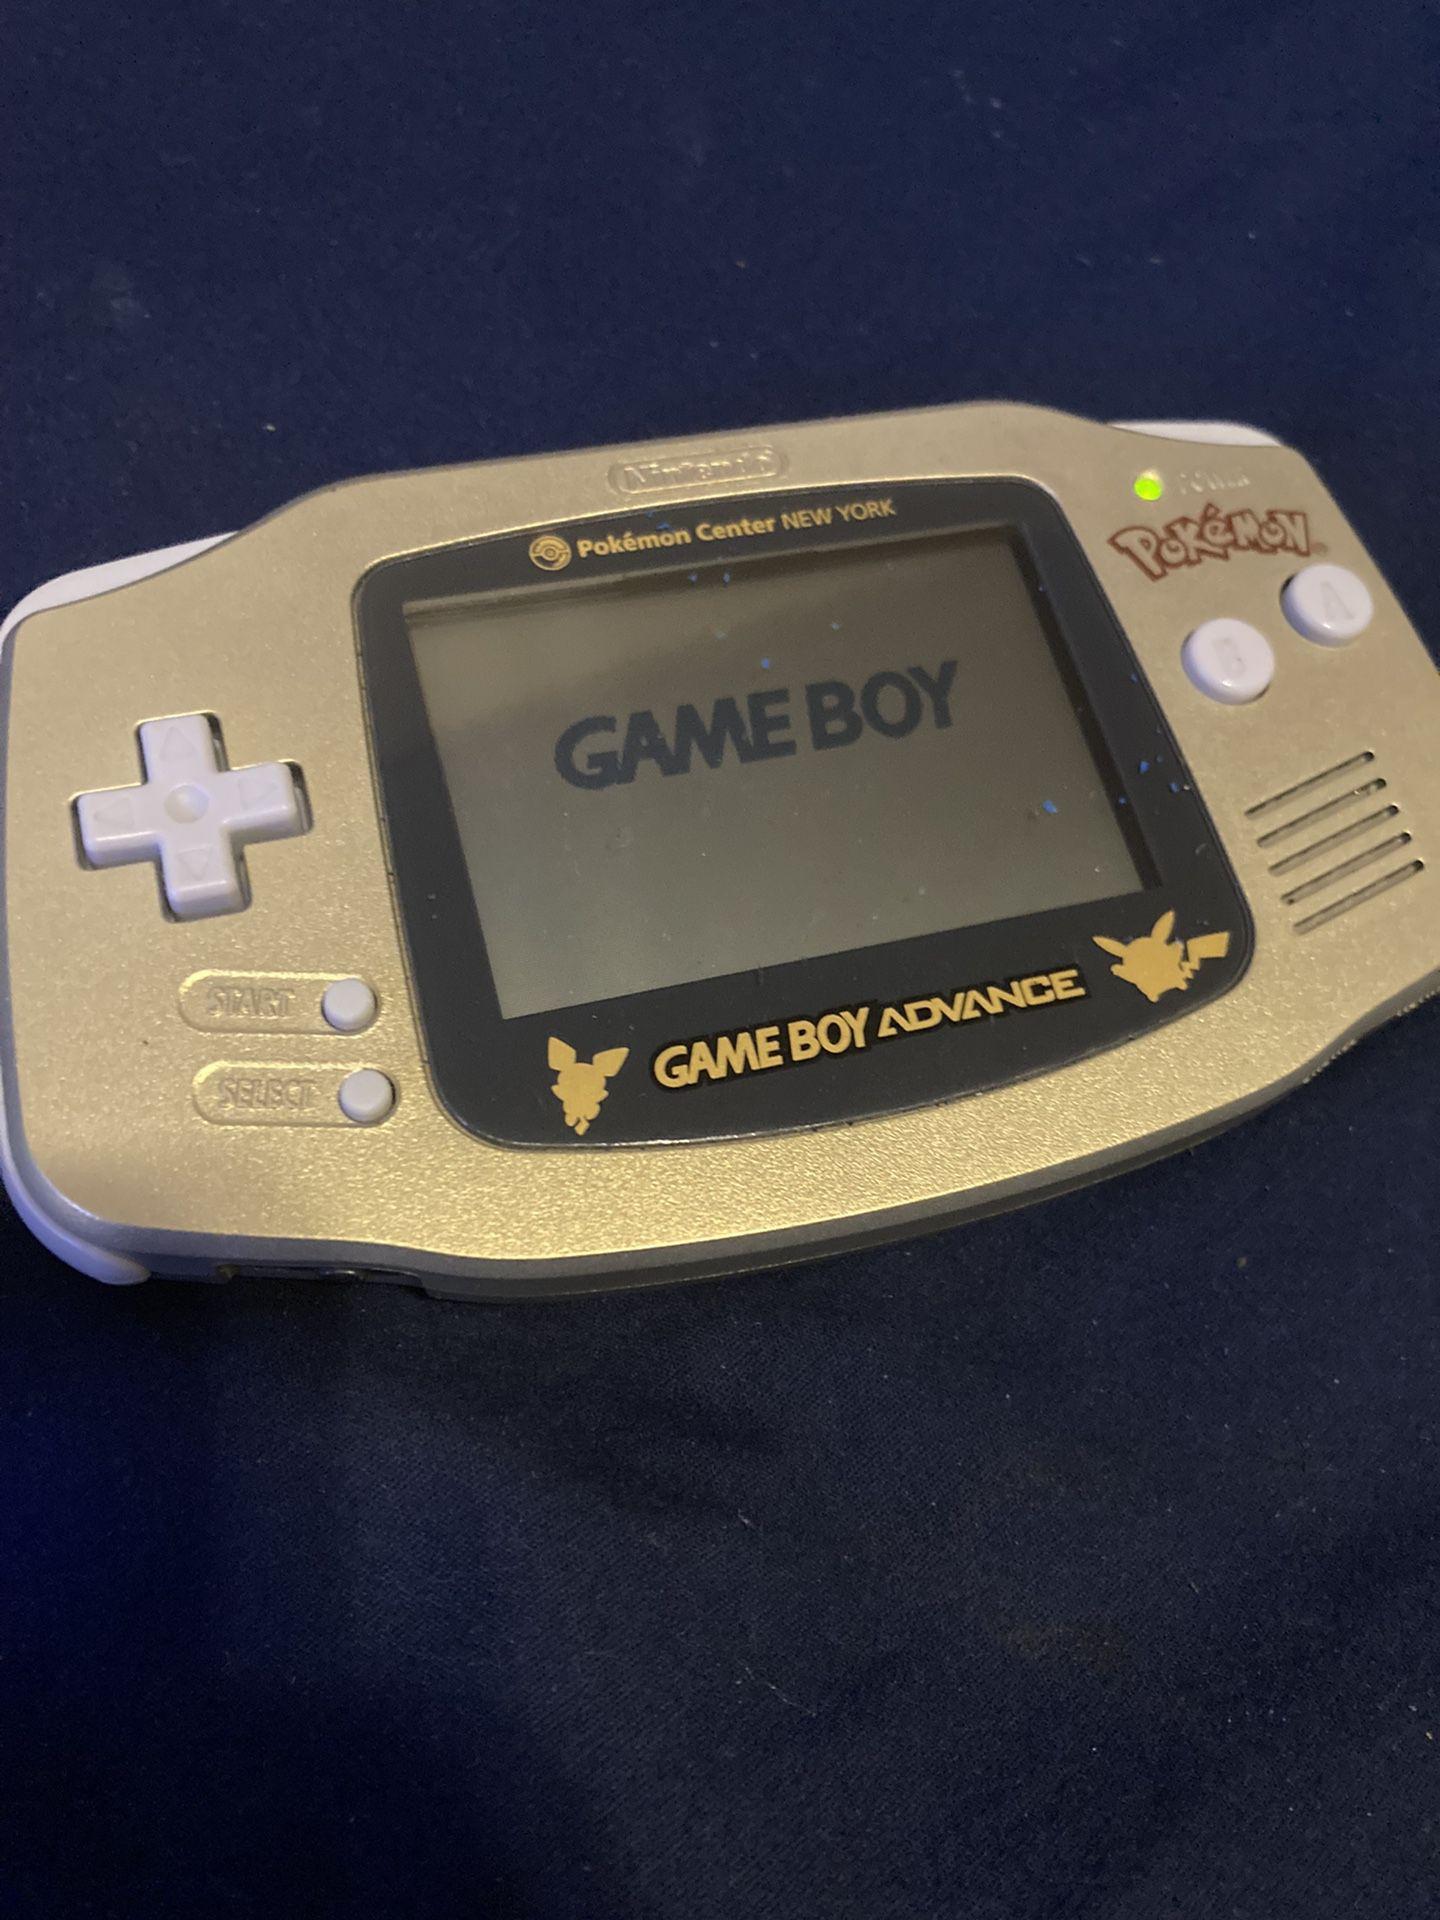 Pokémon Game boy Advance Like New